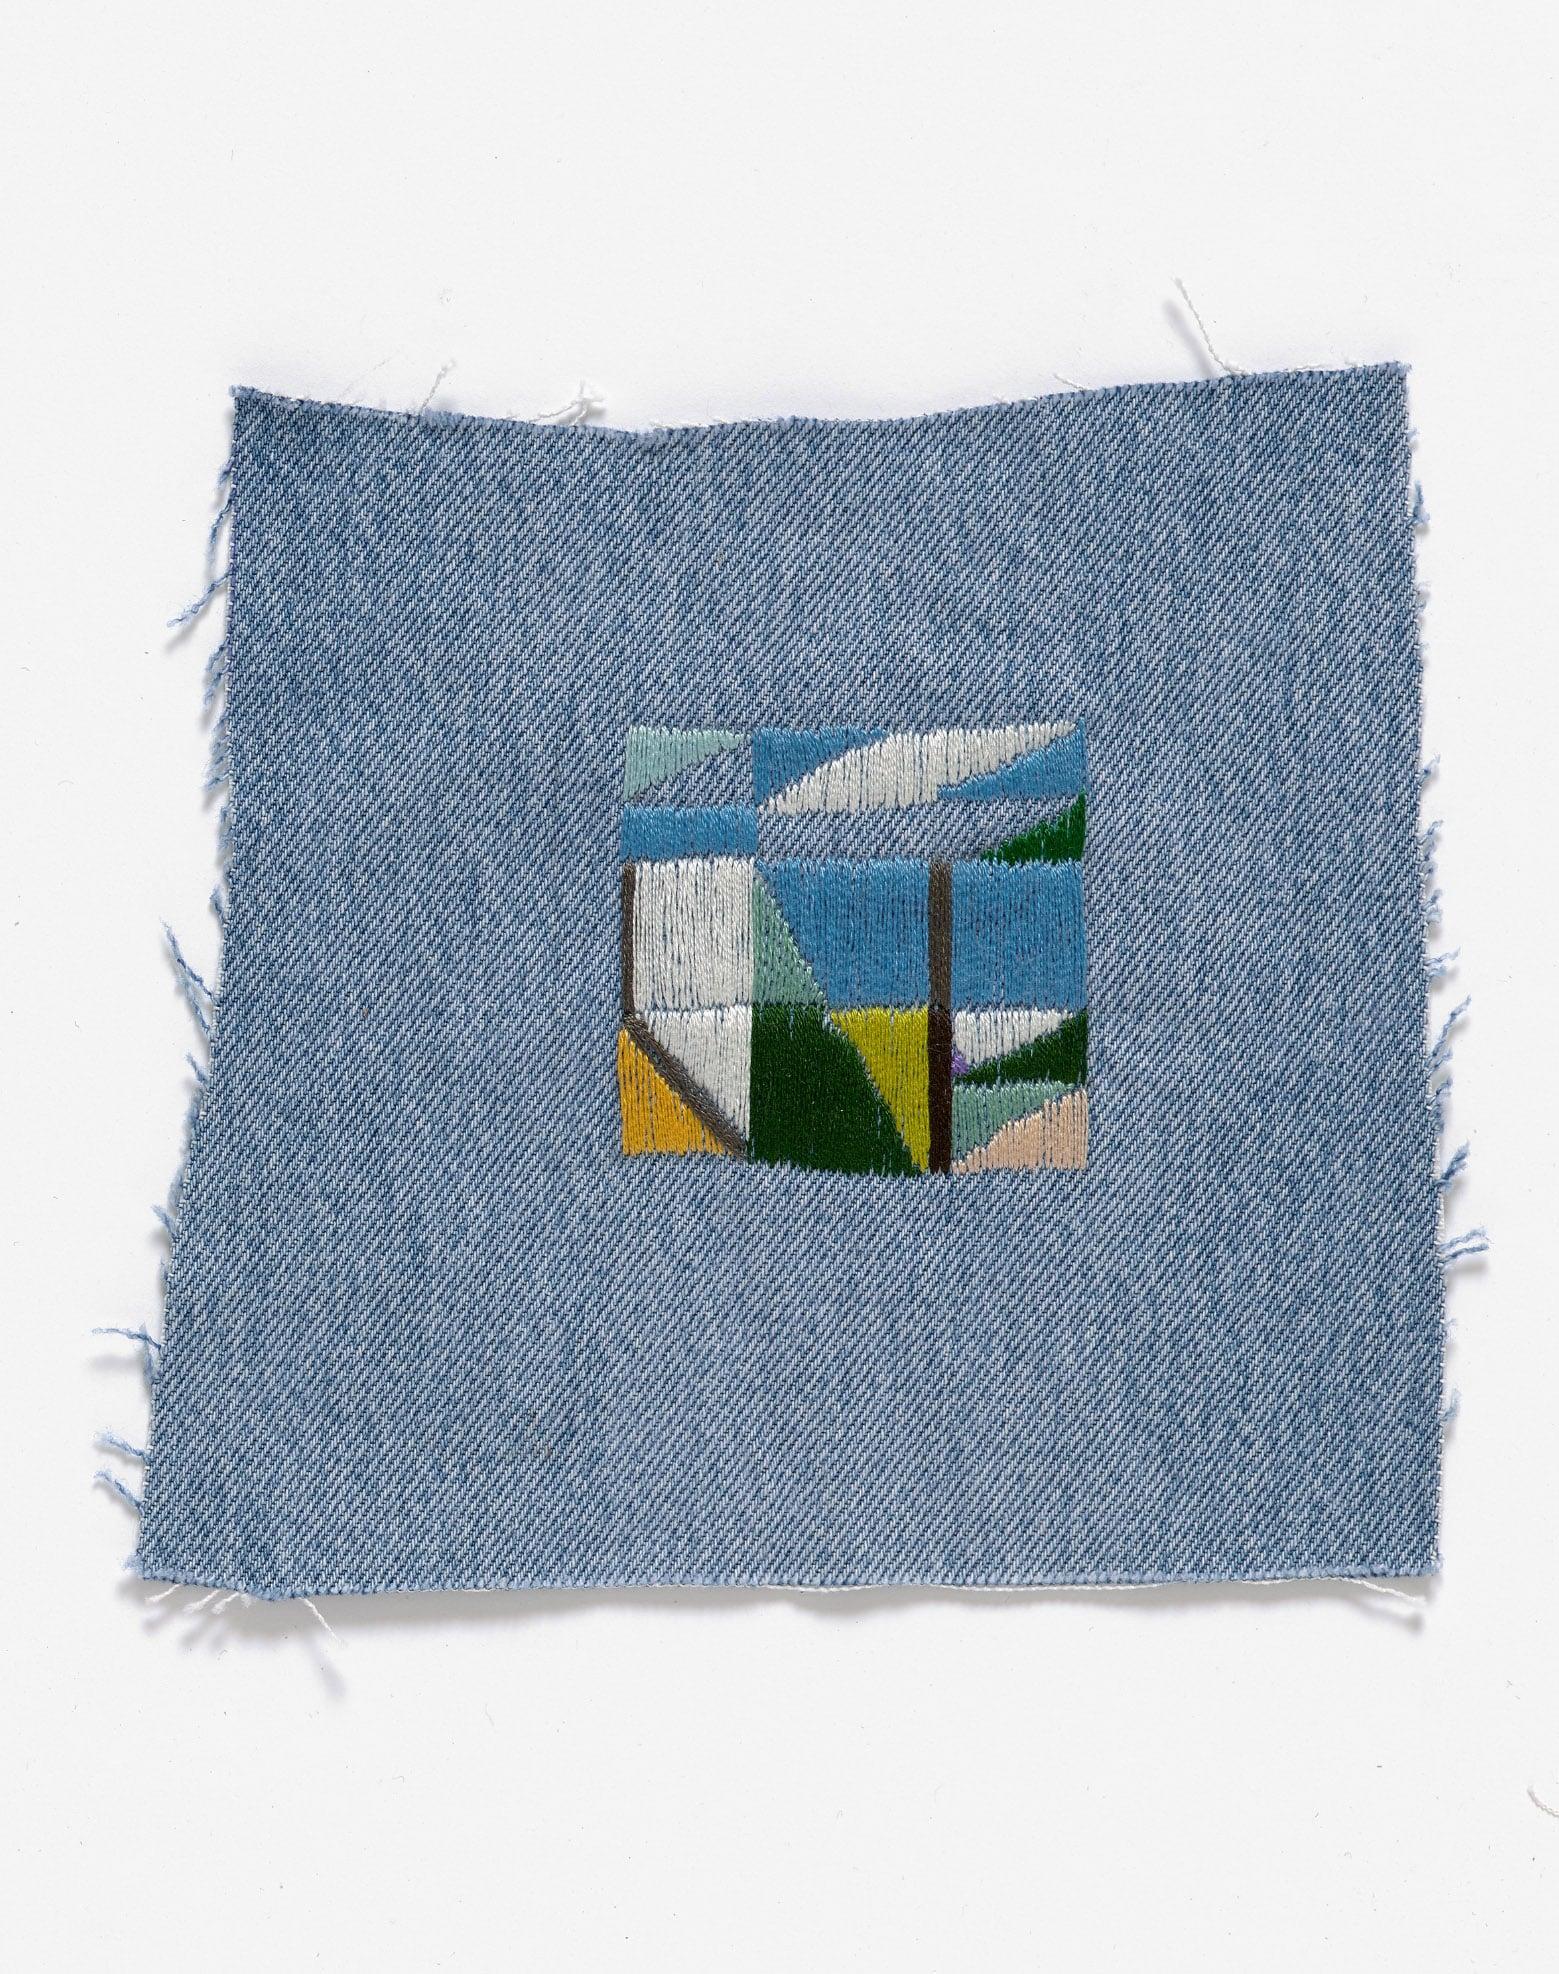 Return to the farm III  2015 Cotton thread on denim 18 x 17cm